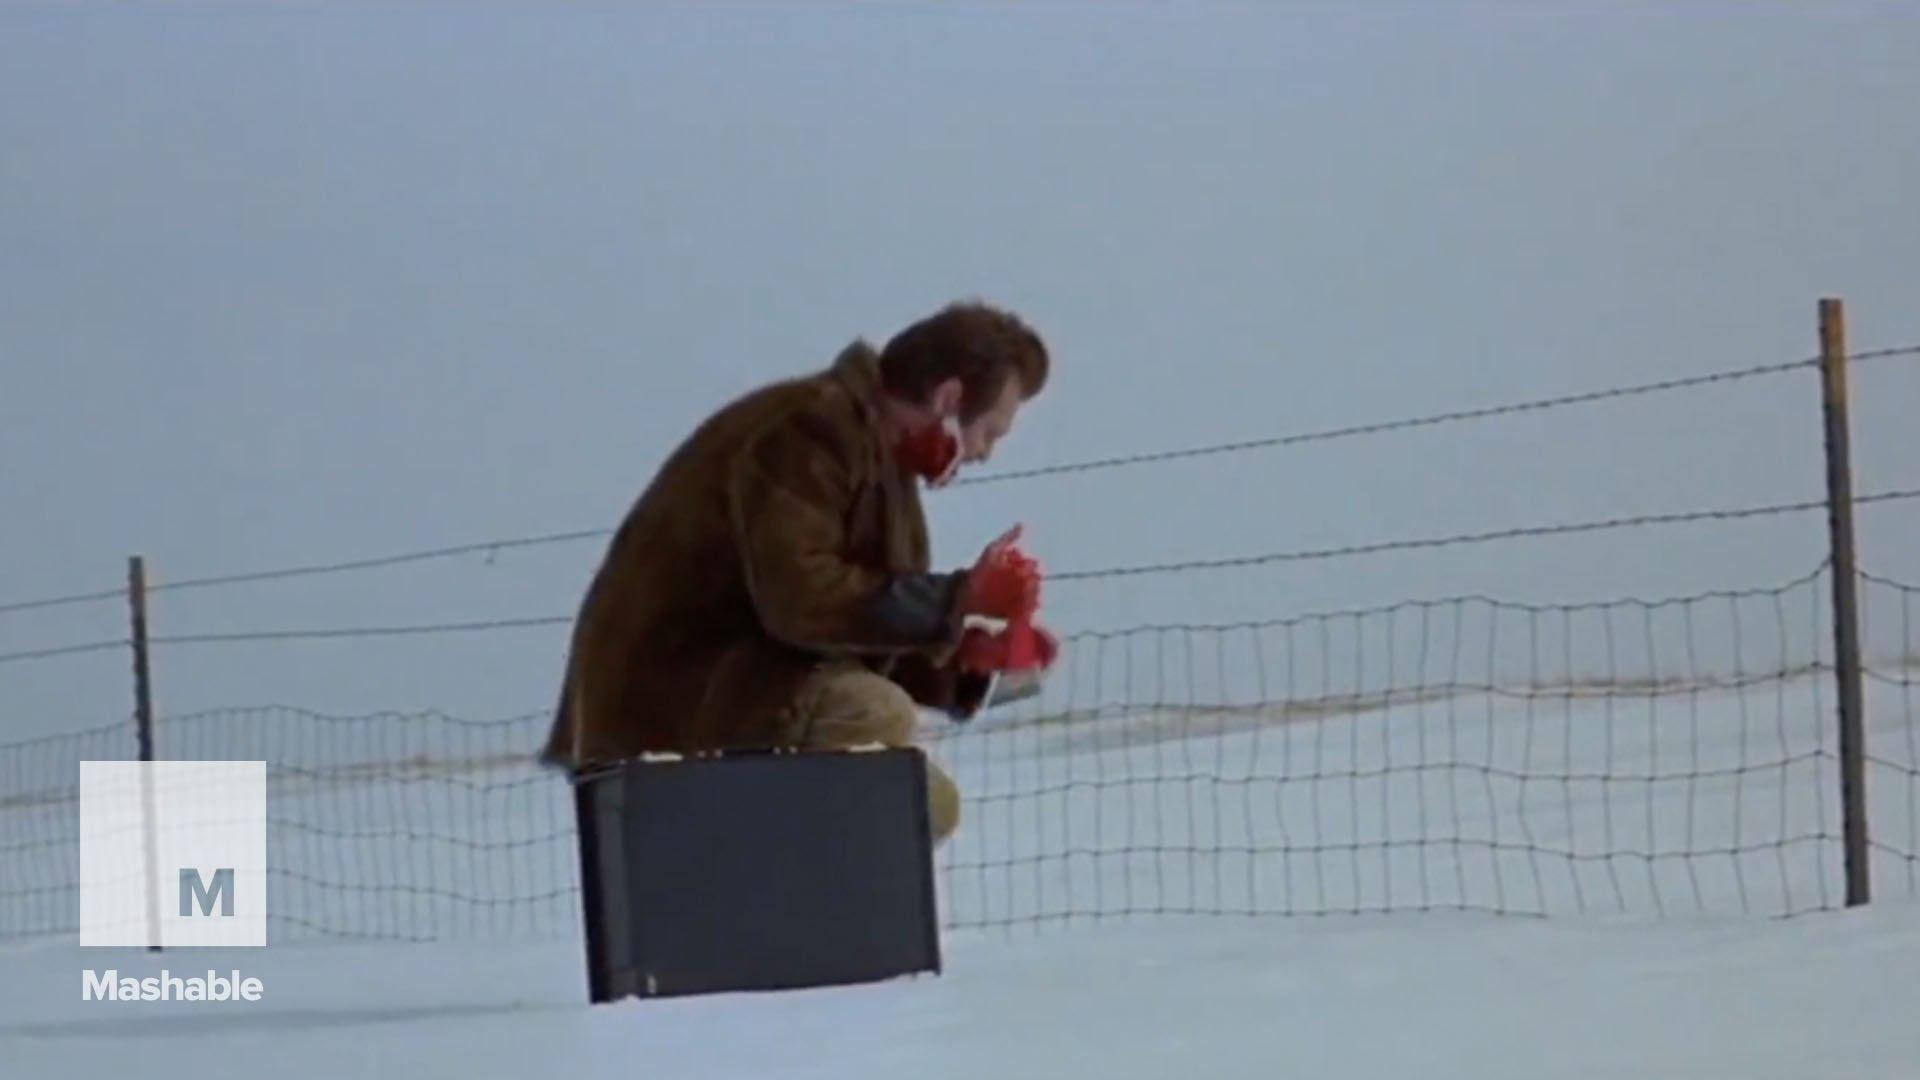 7 darn tootin' fun facts about the movie 'Fargo'